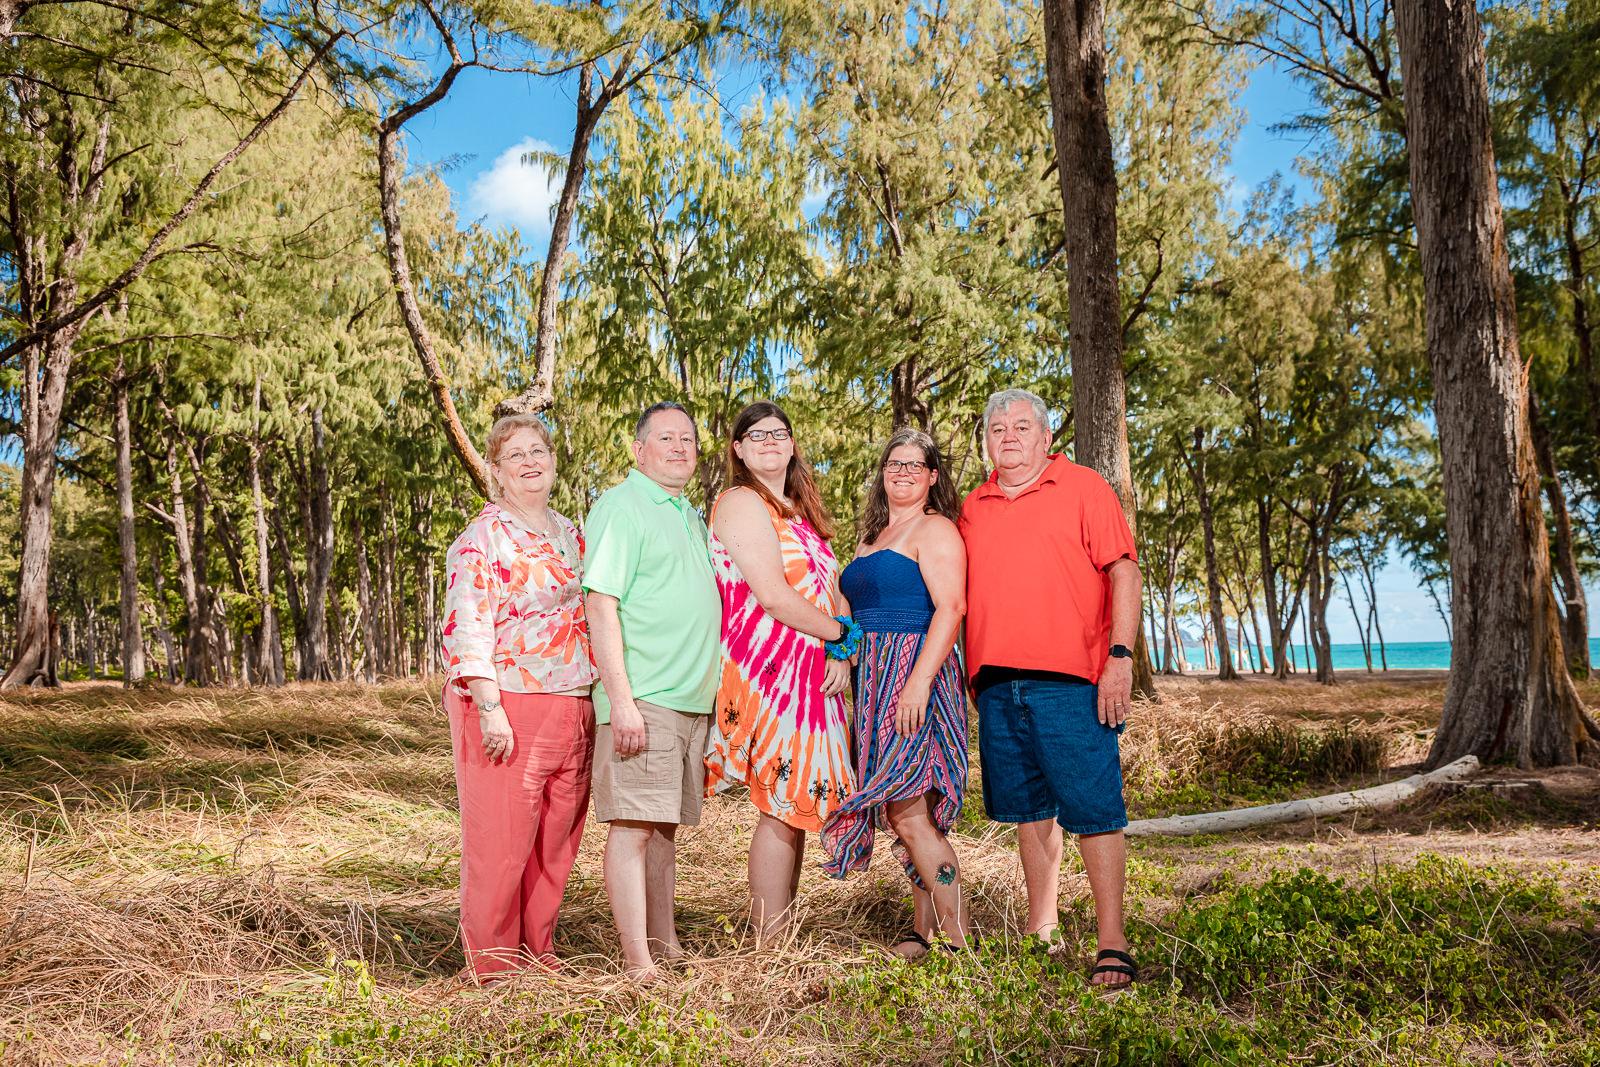 Oahu2019-8525.jpg